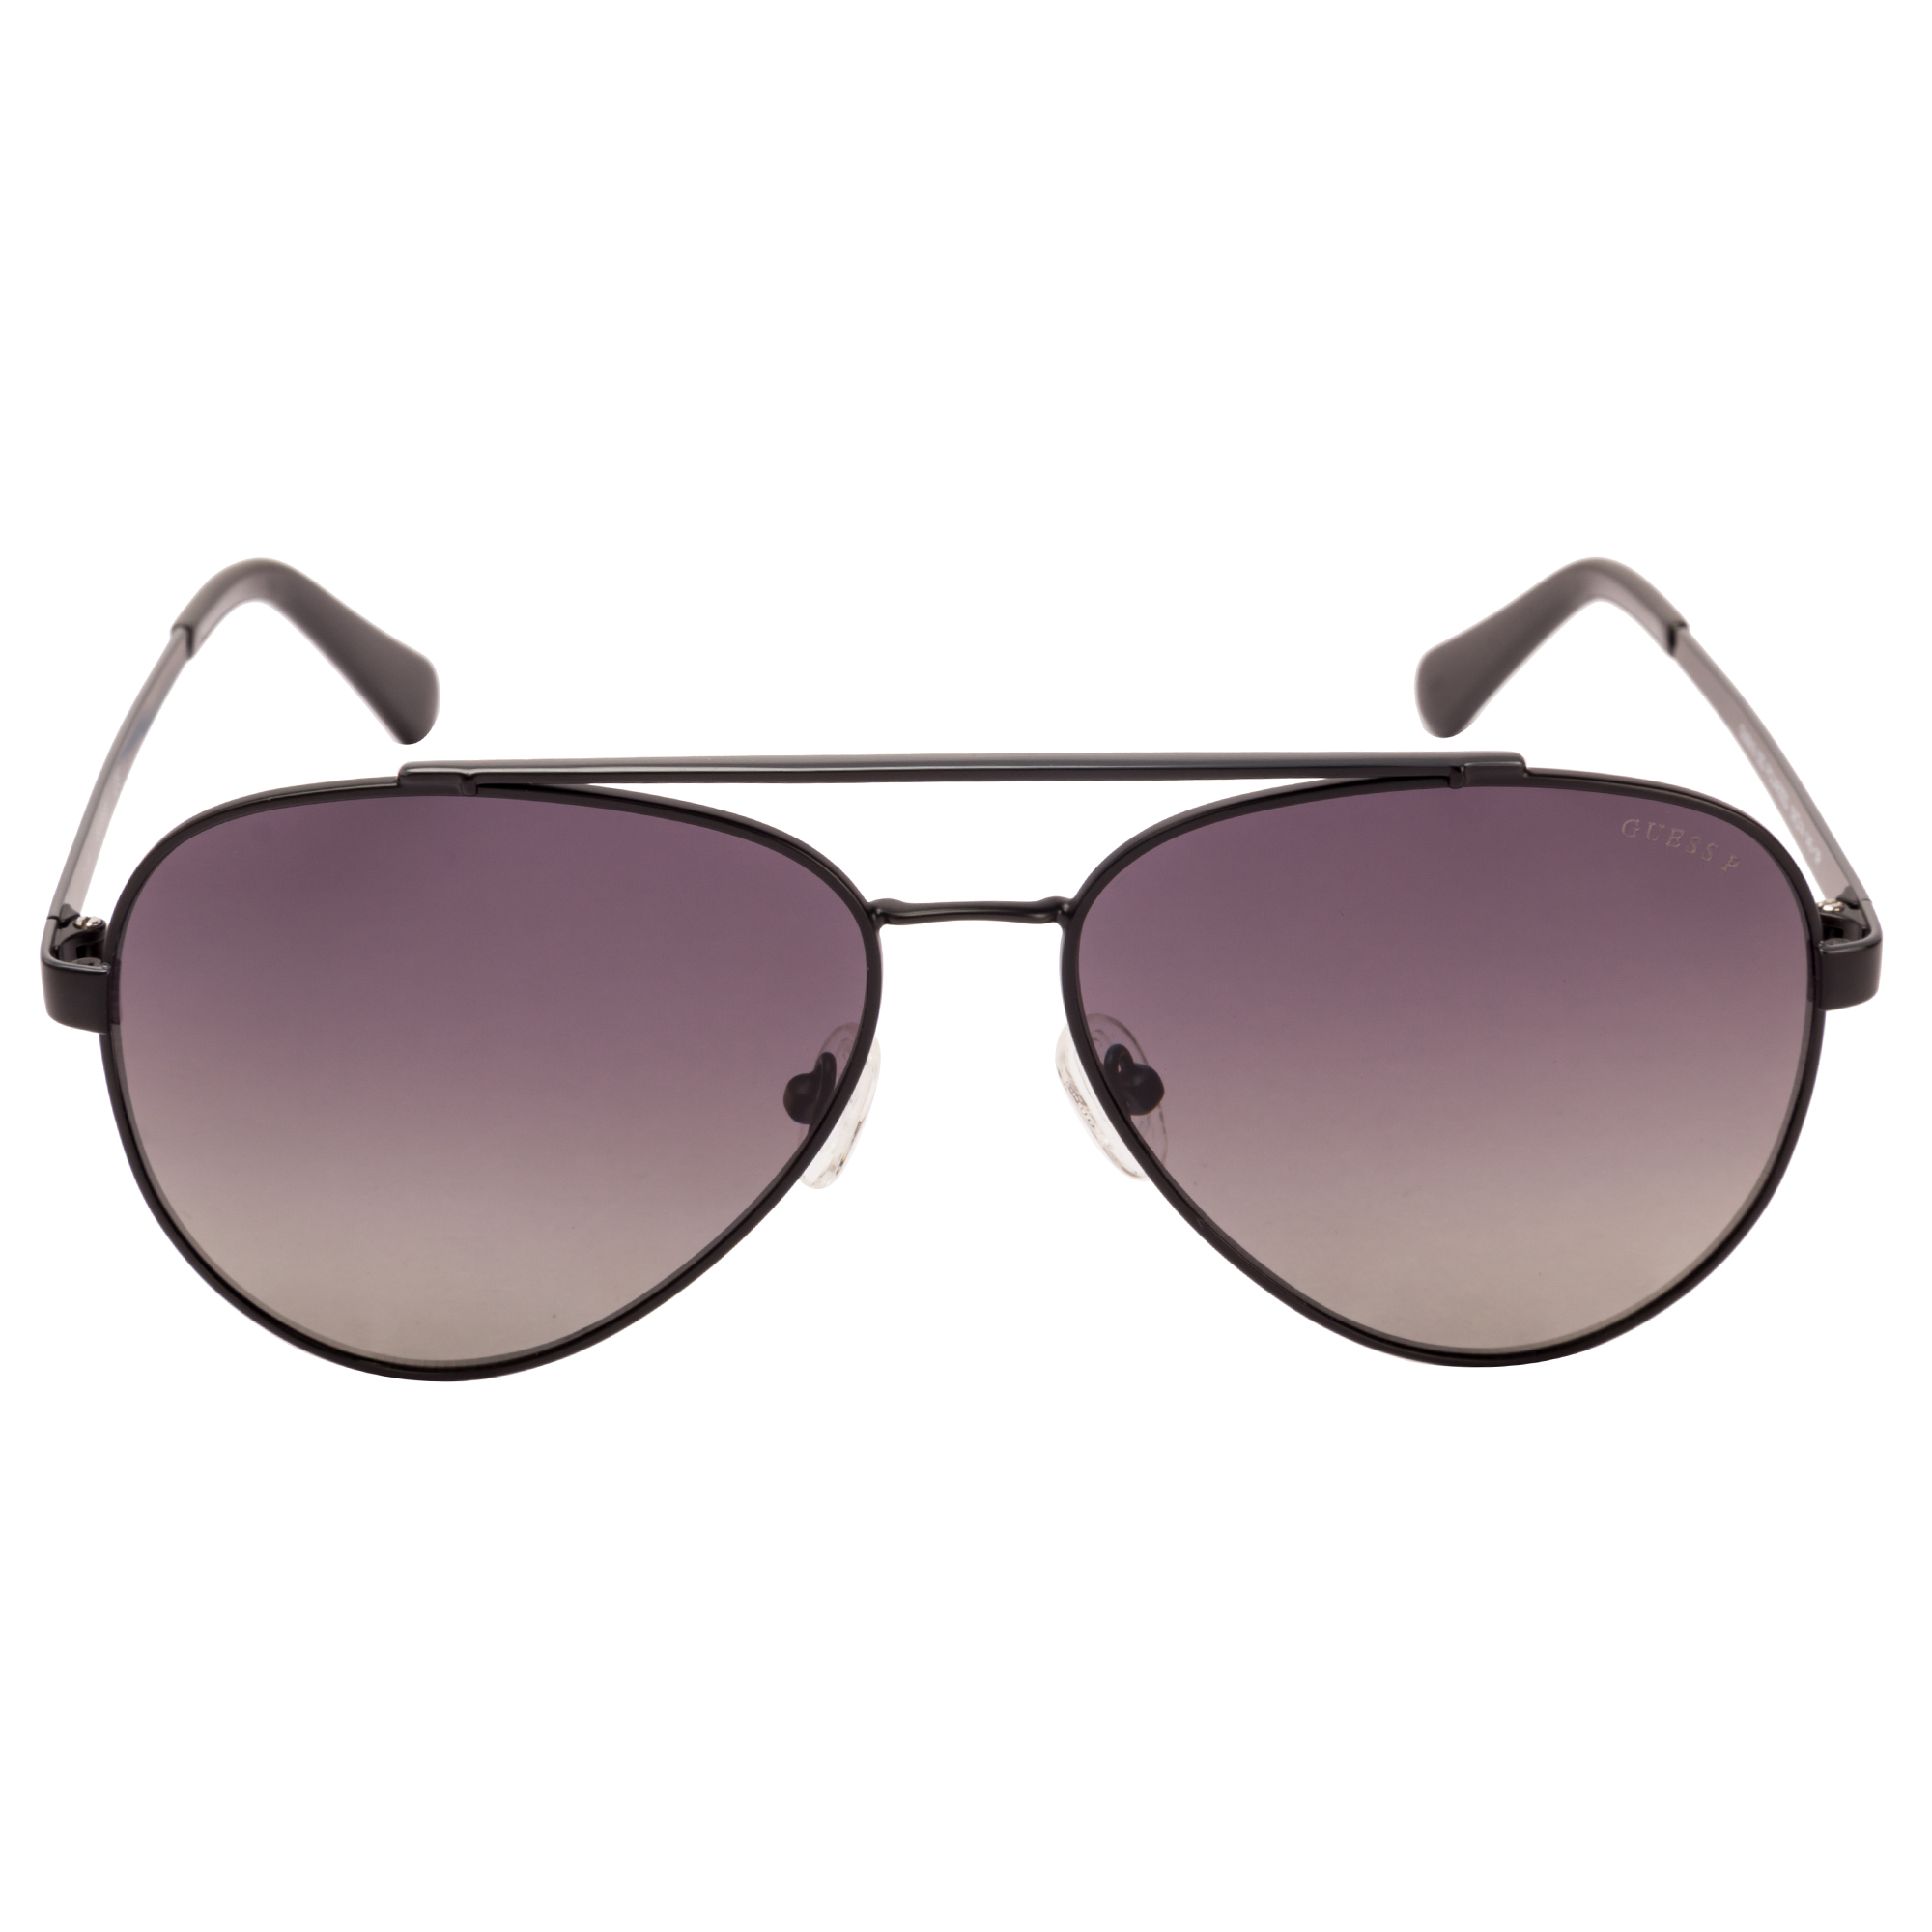 GUESS | Guess Black Frame With Grey Lens Pilot Shape Men Sunglass